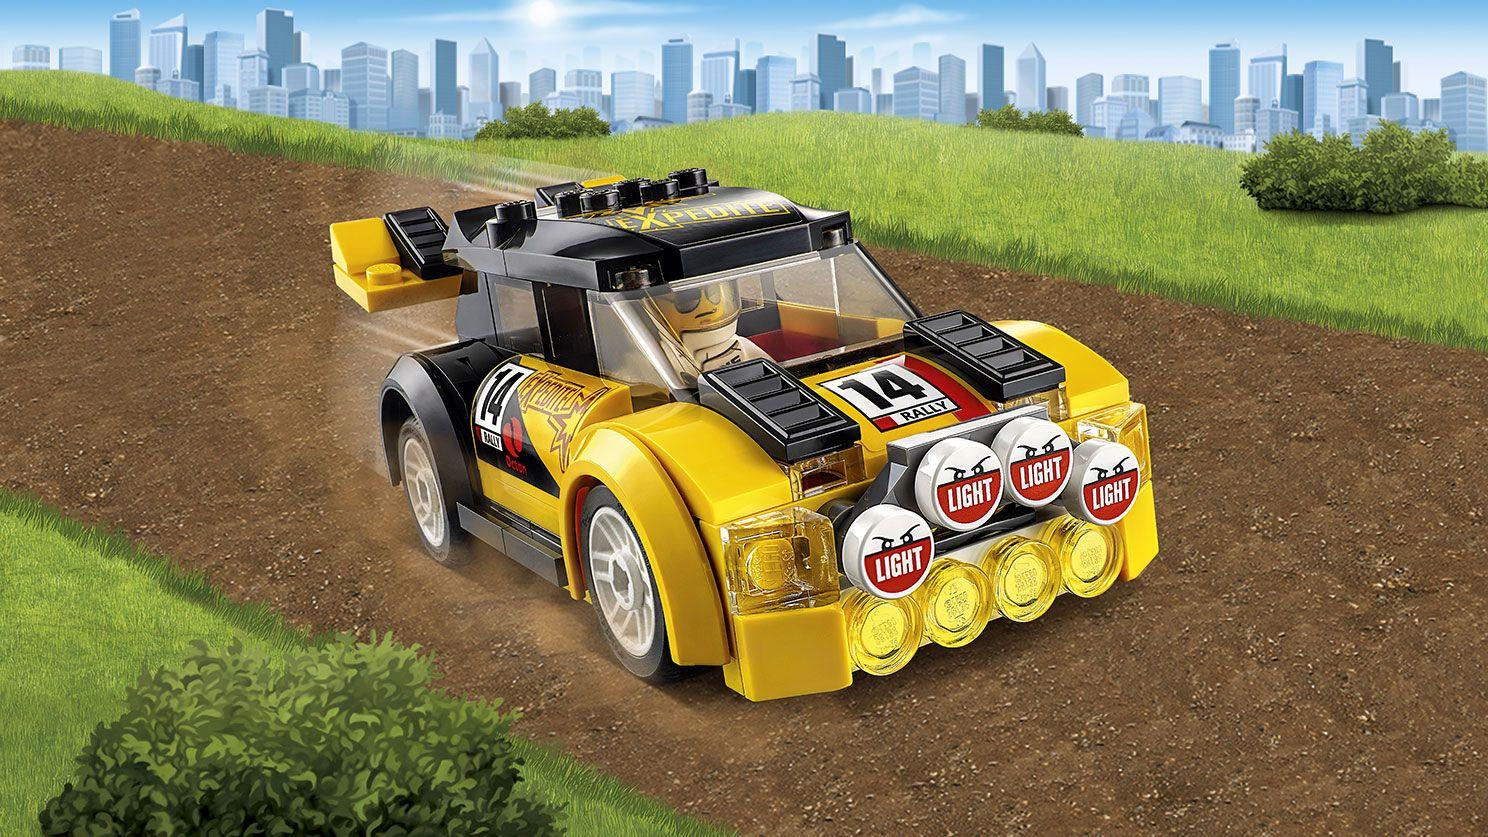 LEGO City yellow rally car on race track Rally Car 60113